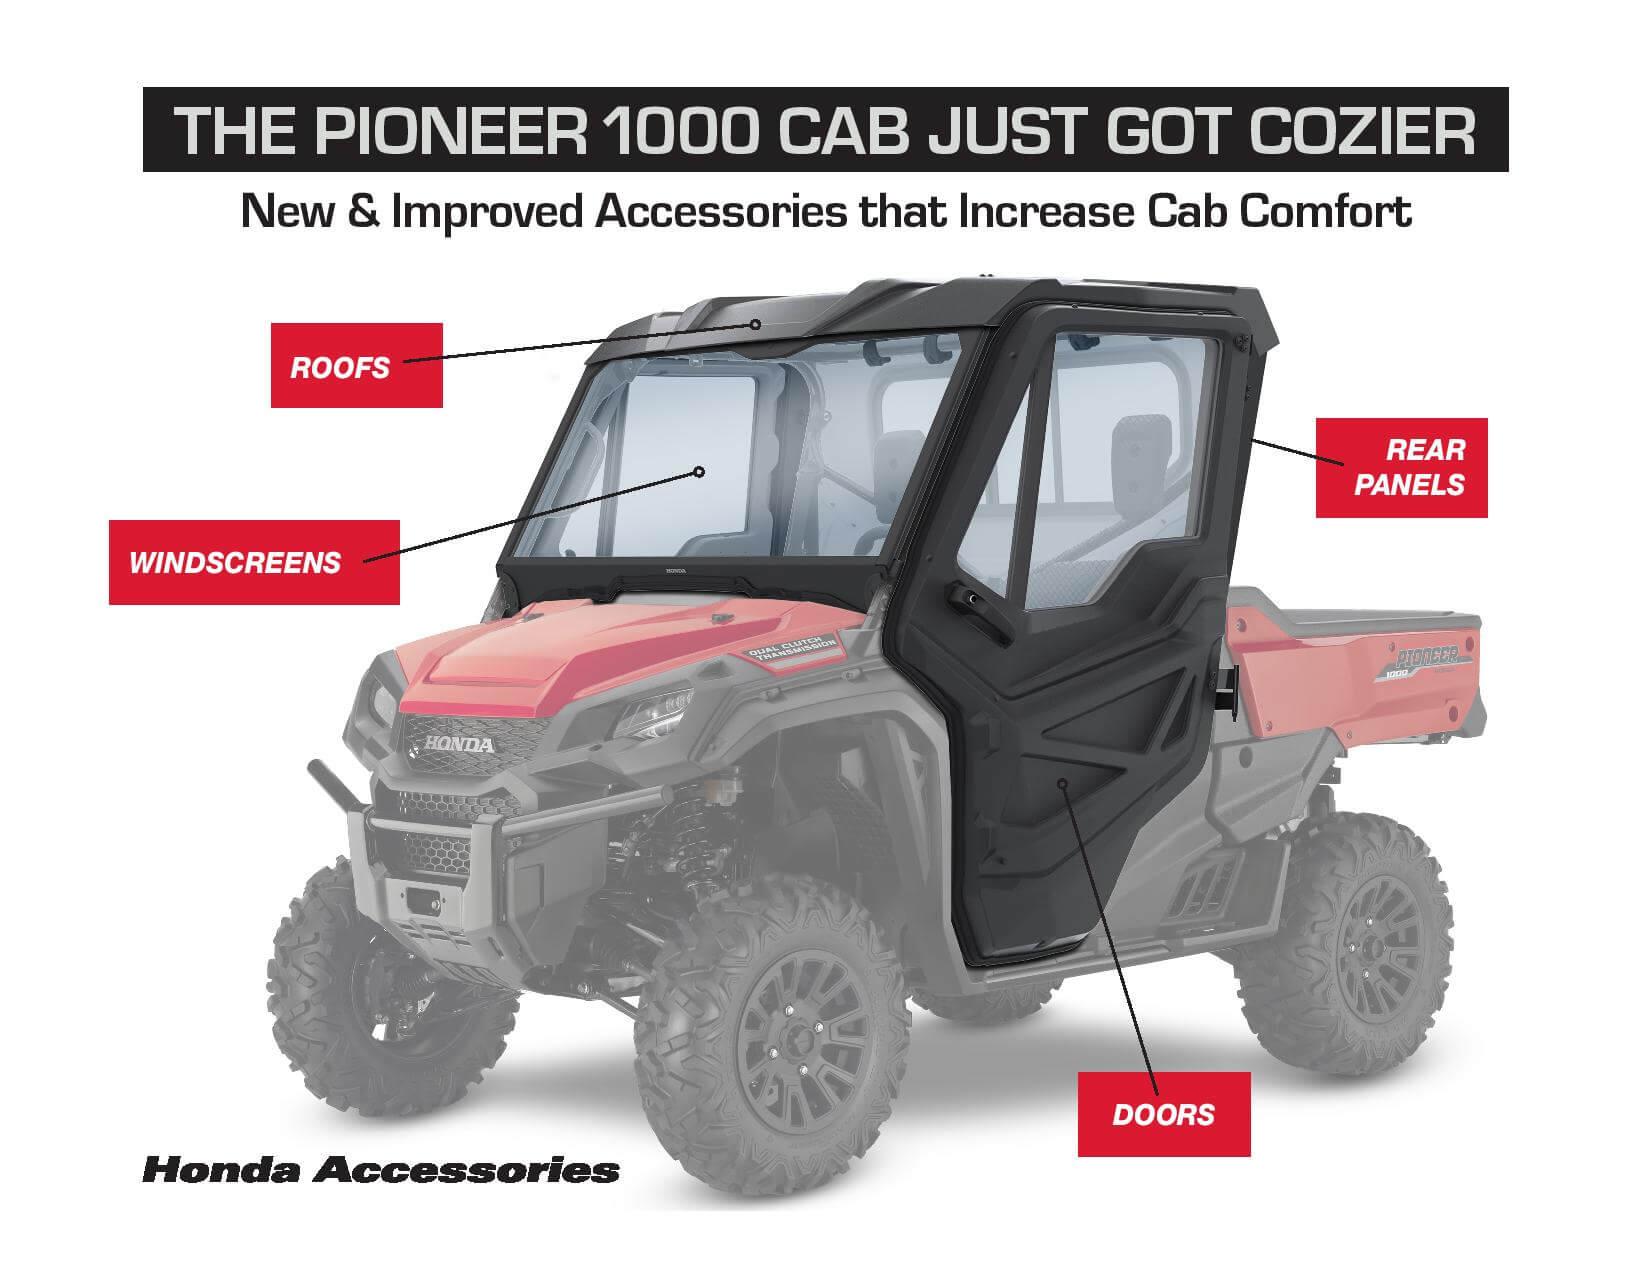 New 2021 Honda Pioneer 1000 Accessories / Parts | Discount Prices